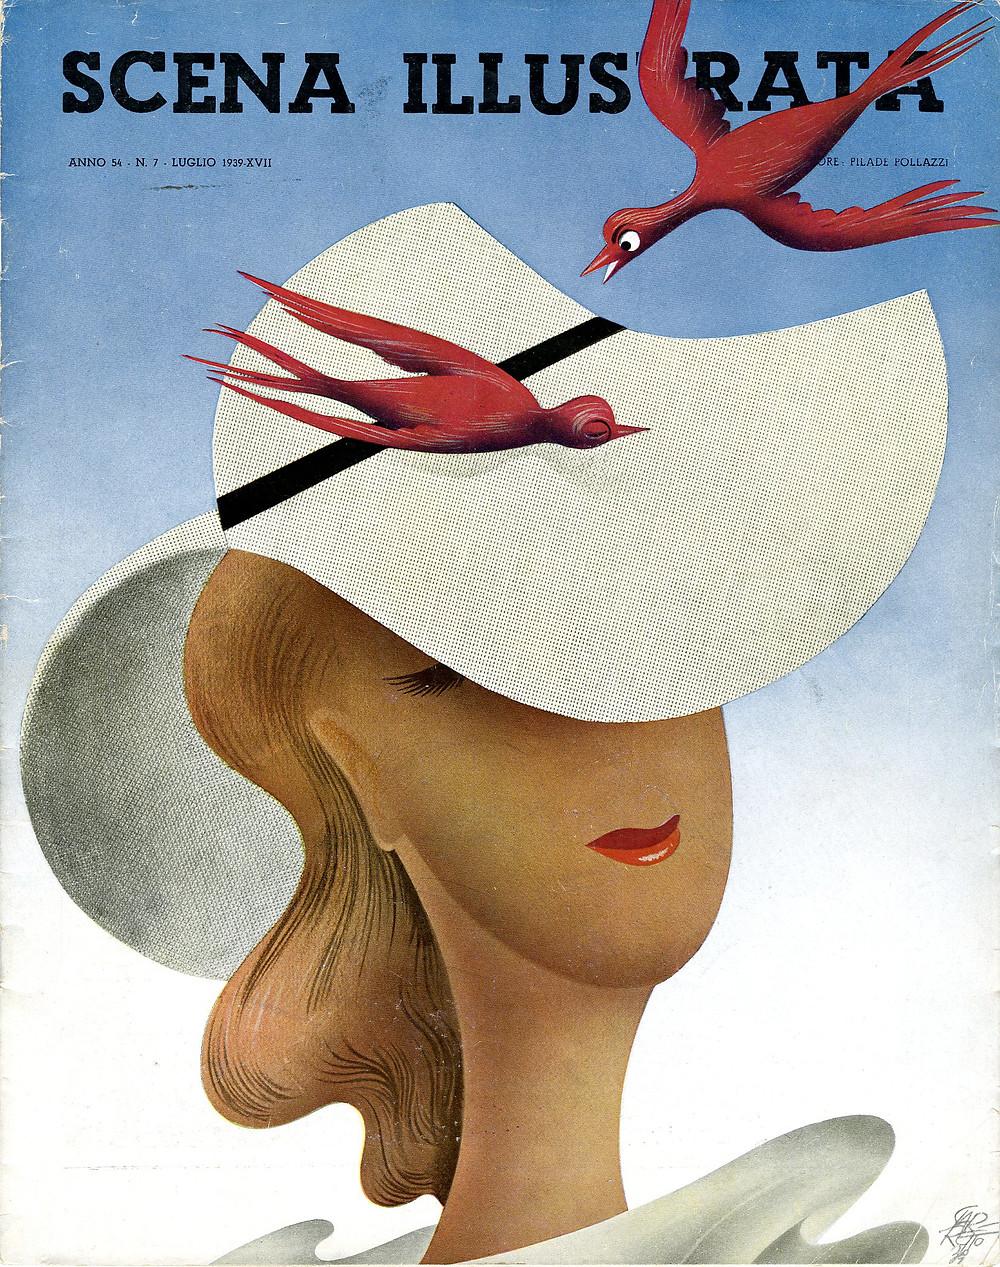 Paolo Garretto is an Italian illustrator.